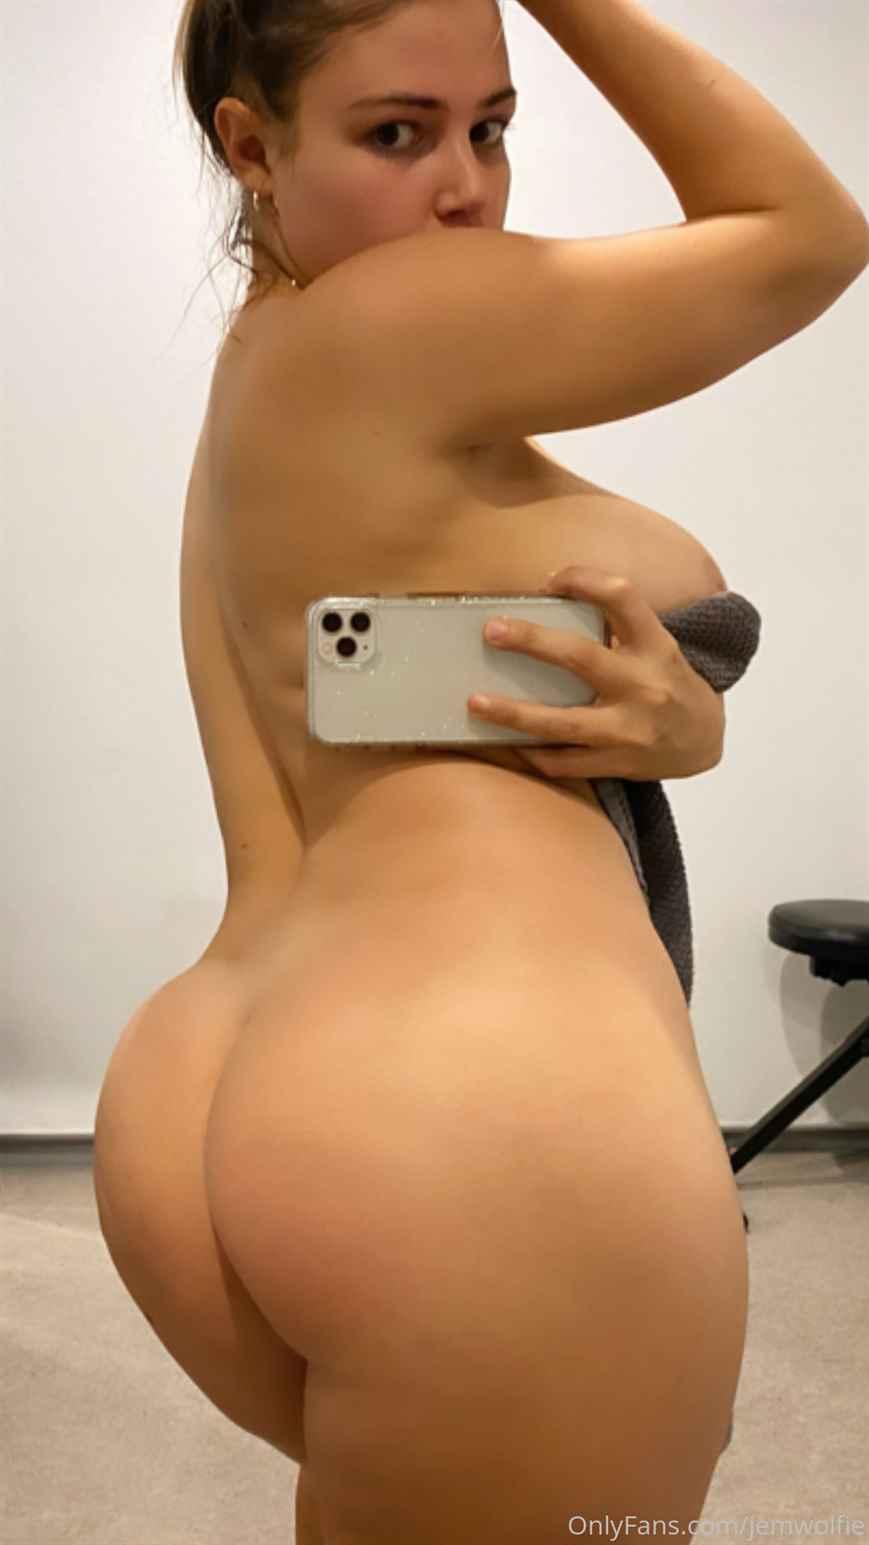 jem wolfie nude selfie - Jem Wolfie Jiggle Nude Natural Big Boobs OnlyFans